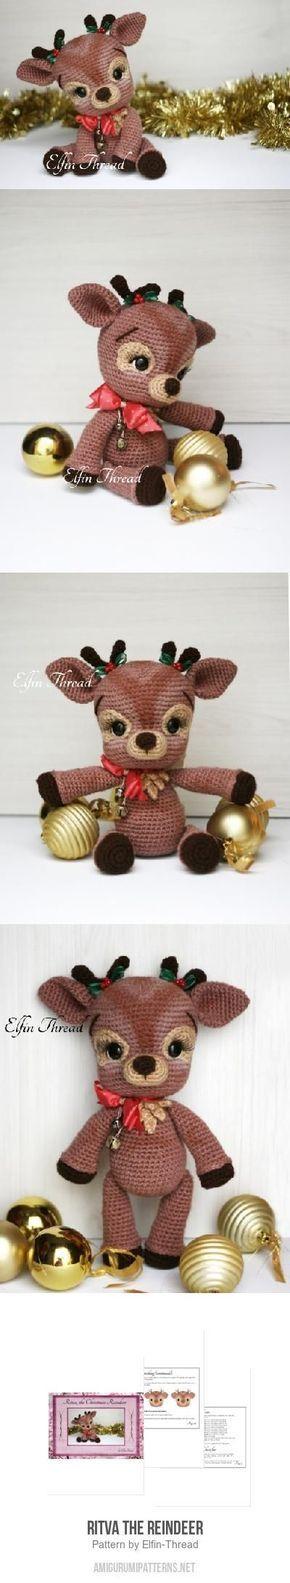 Ritva the Reindeer amigurumi pattern